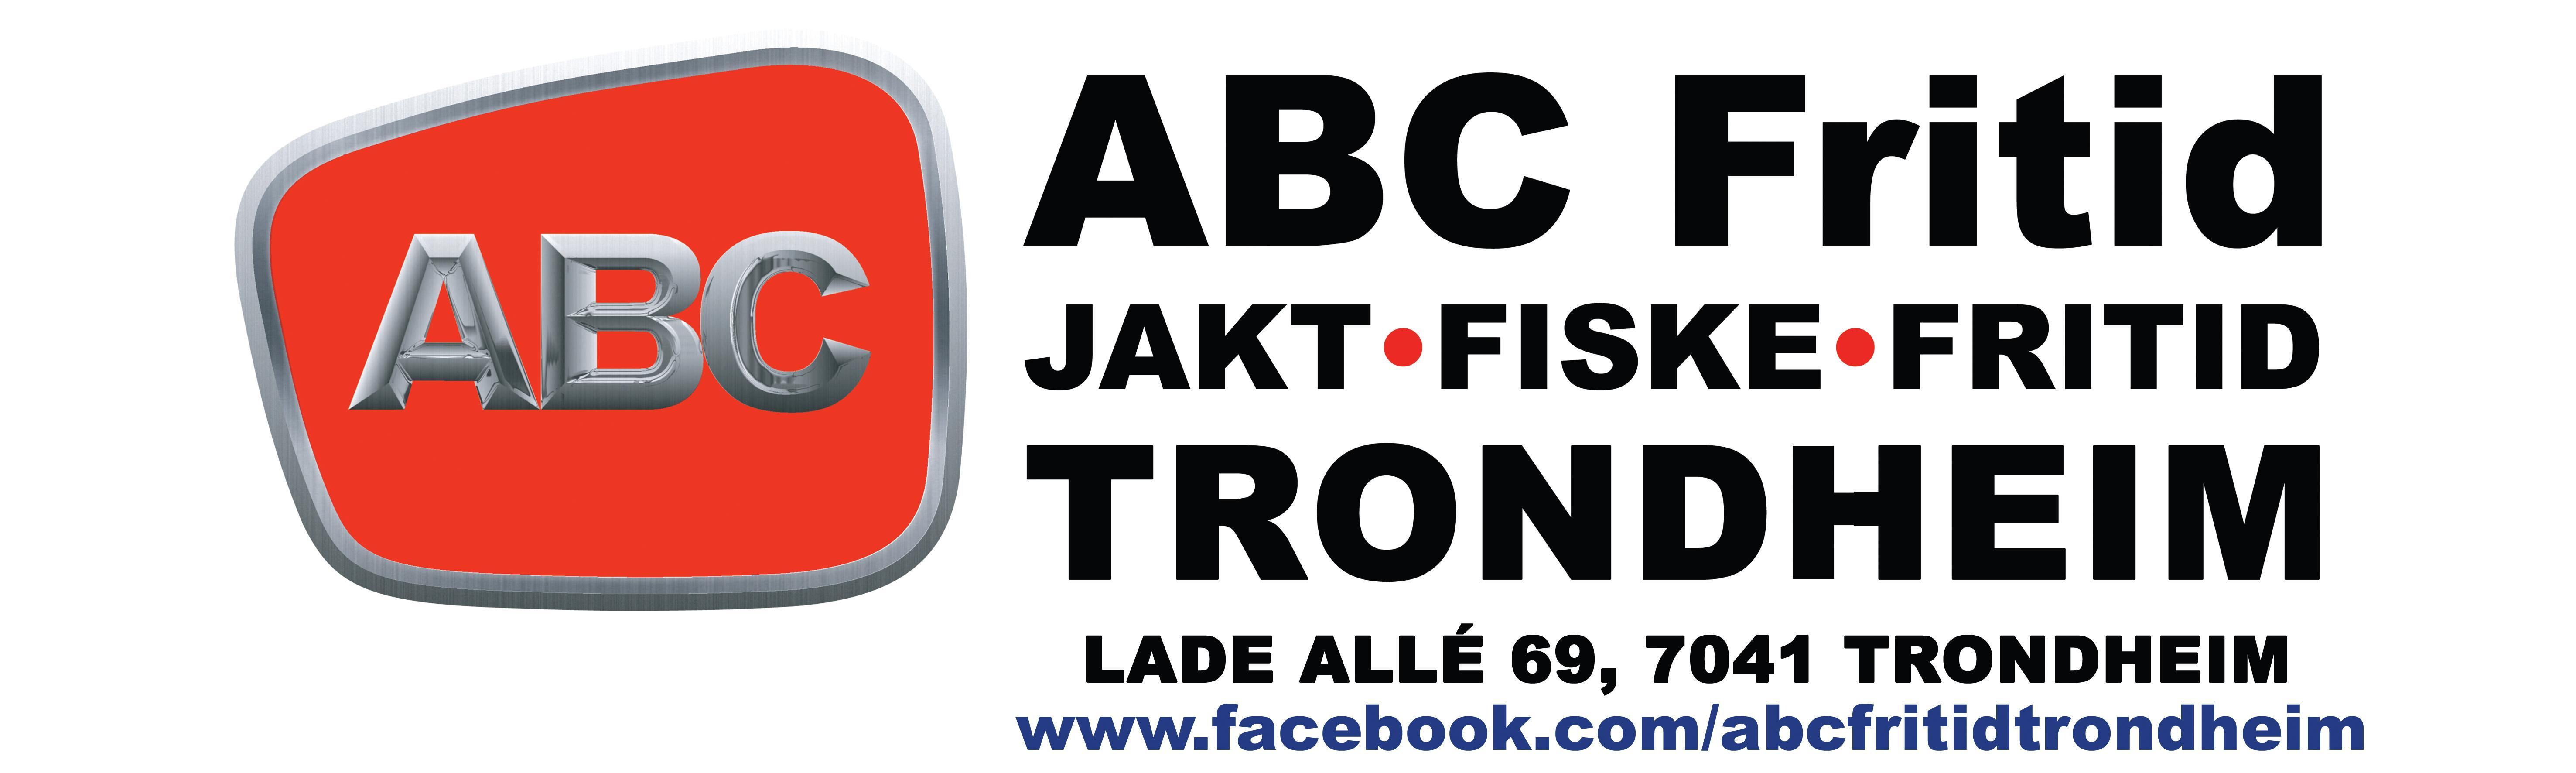 ABC Fritid